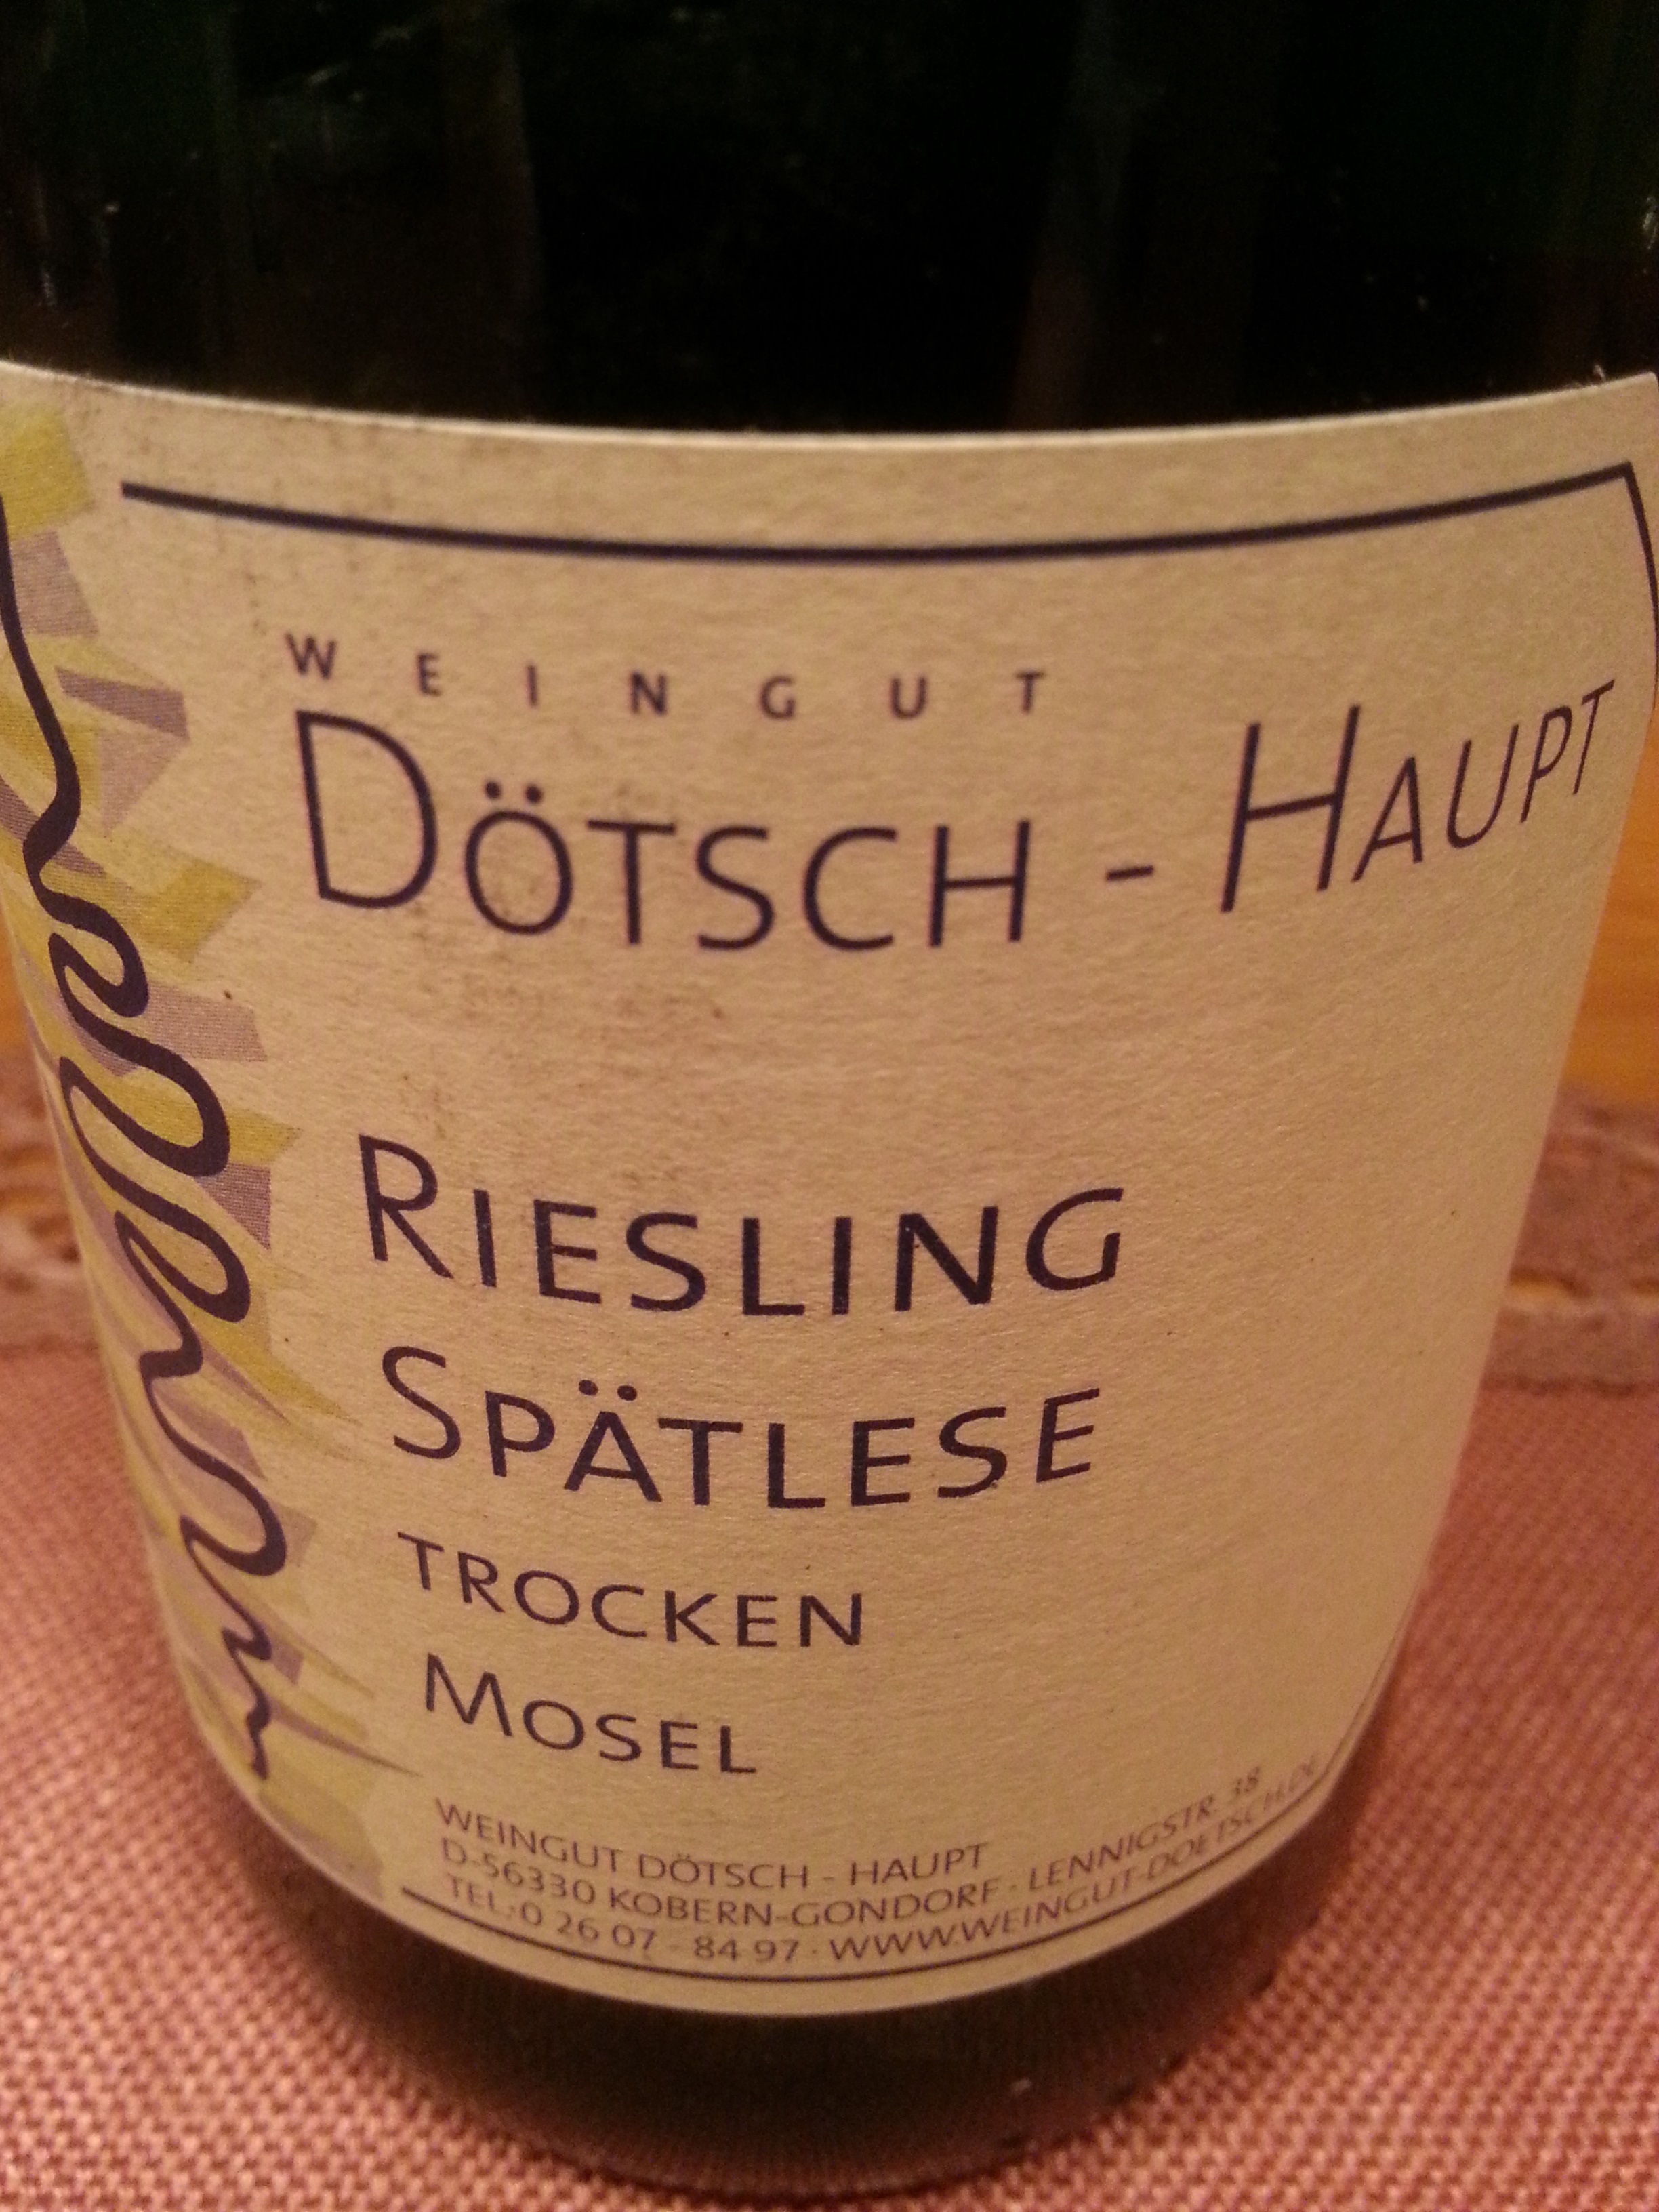 2005 Riesling Spätlese trocken Koberner Uhlen | Dötsch-Haupt